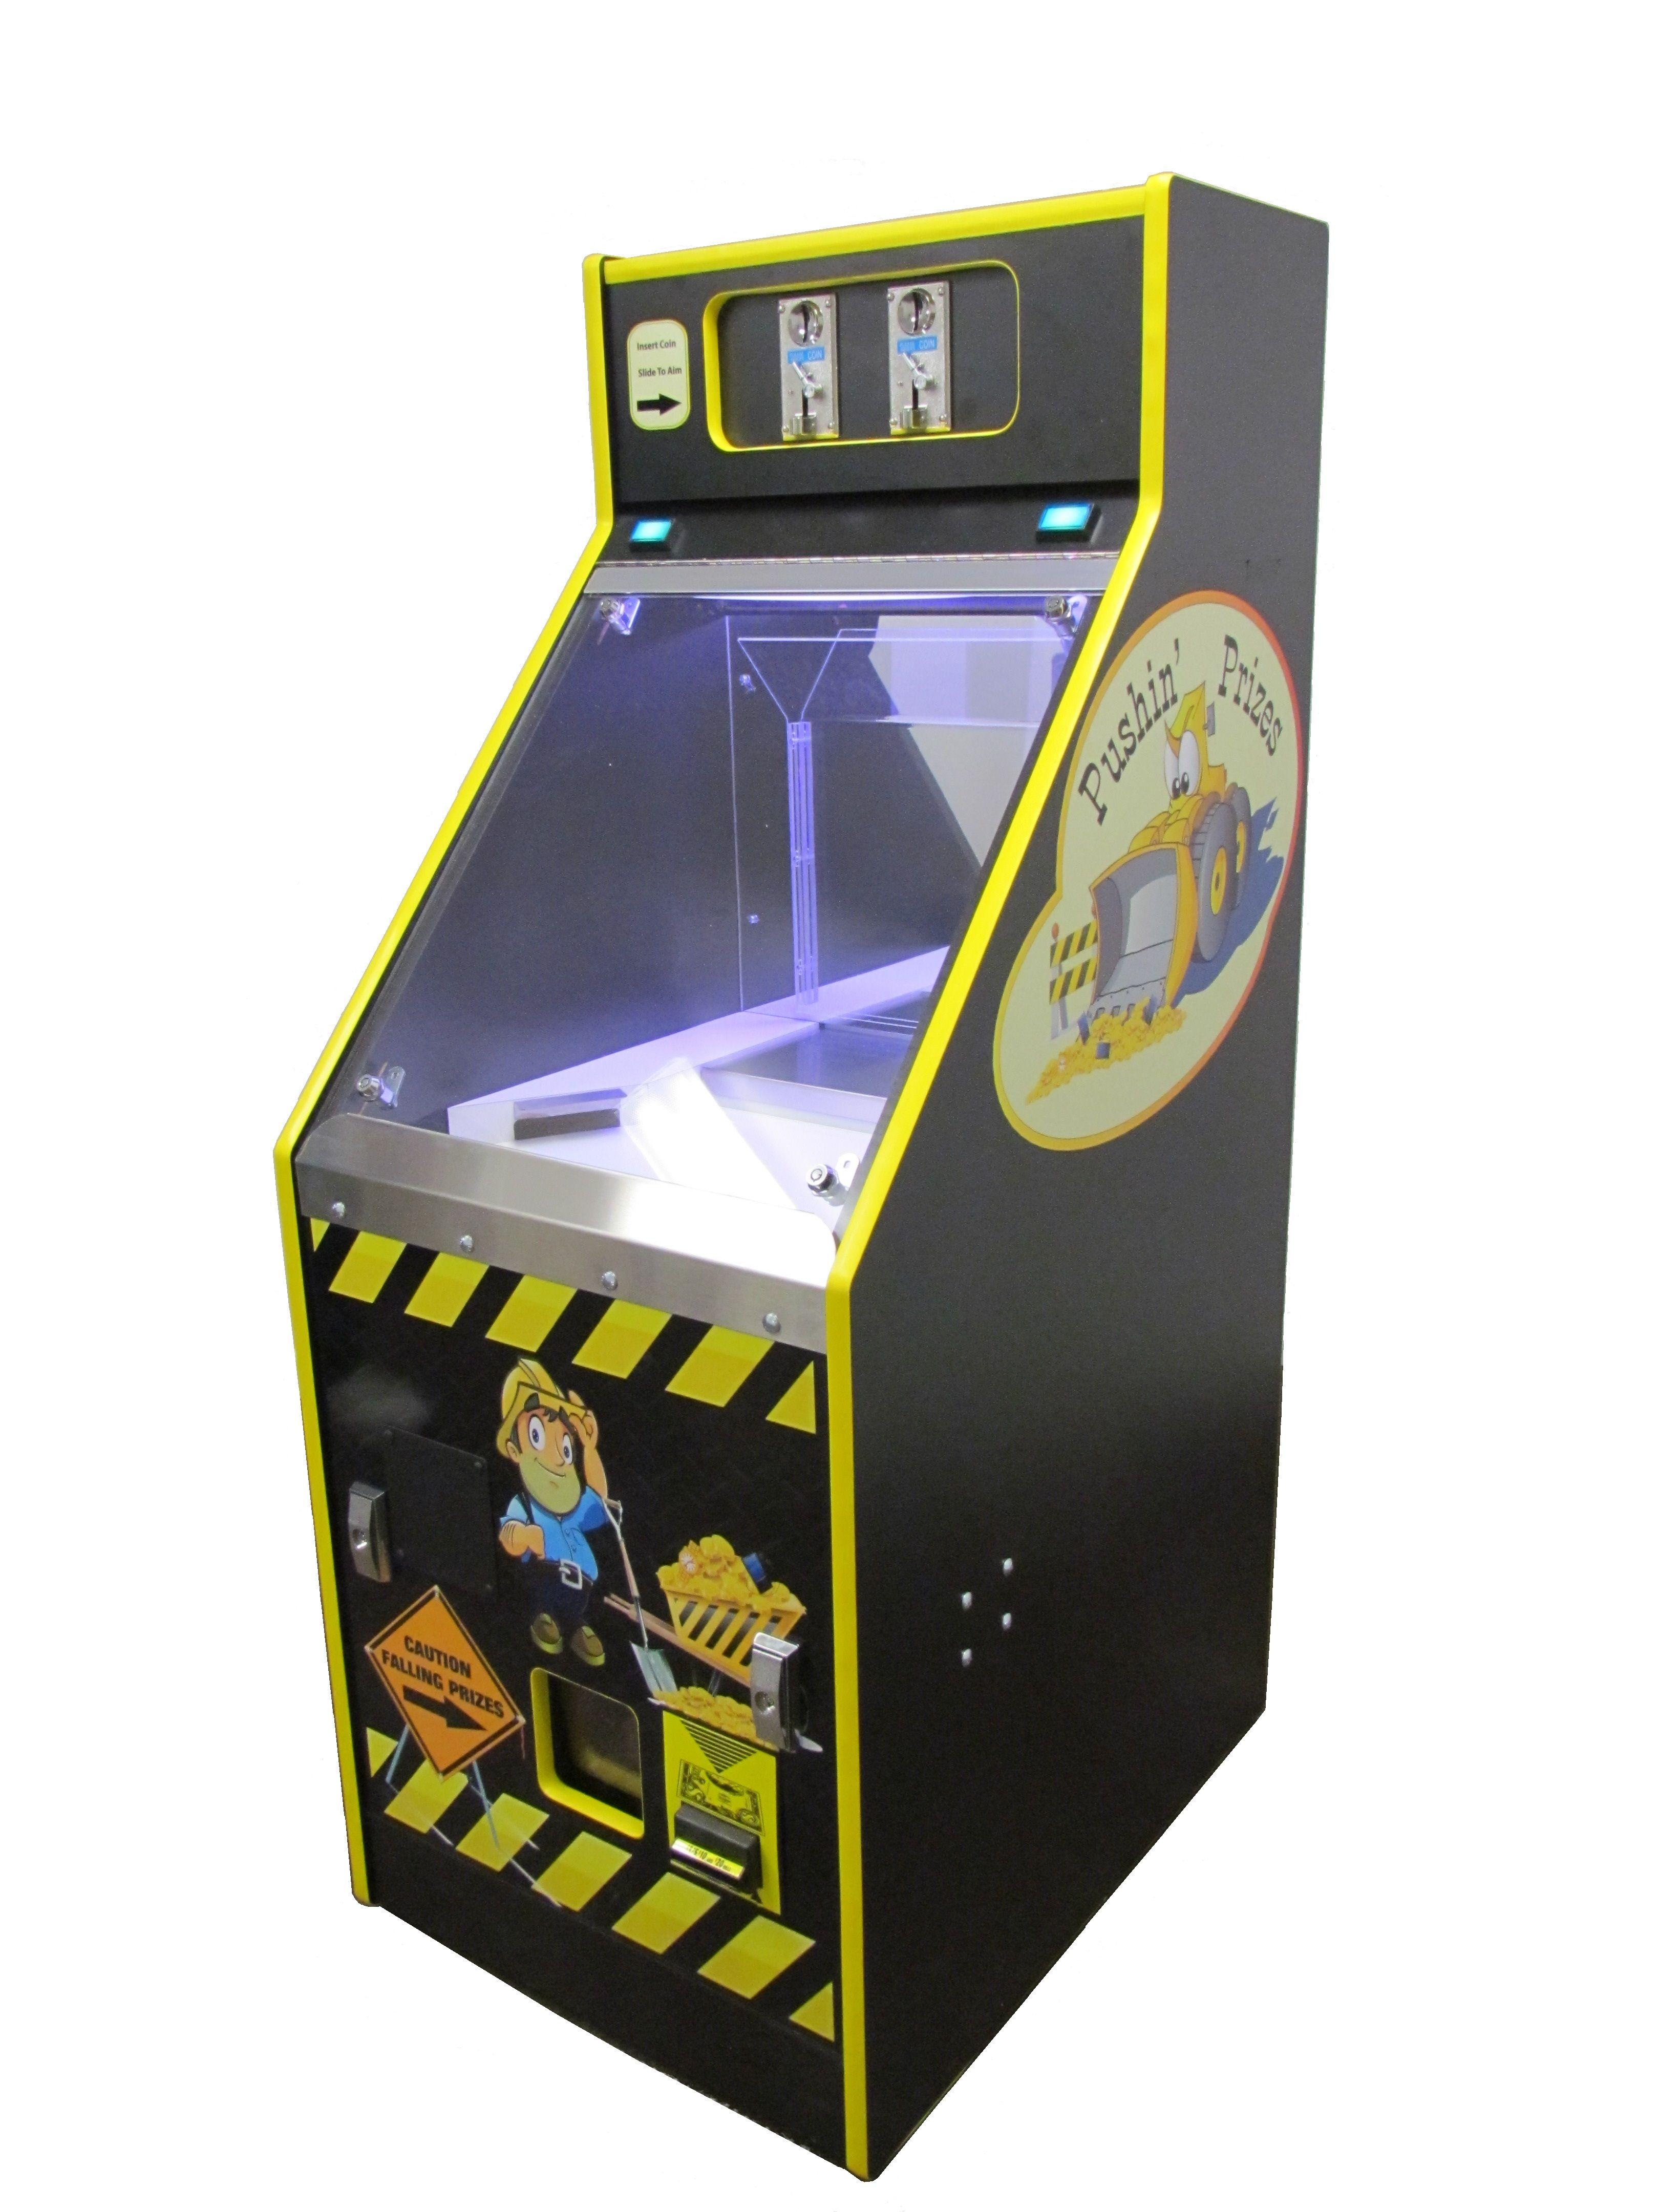 Pushin' Prizes coin pusher | quarter pusher amusement game